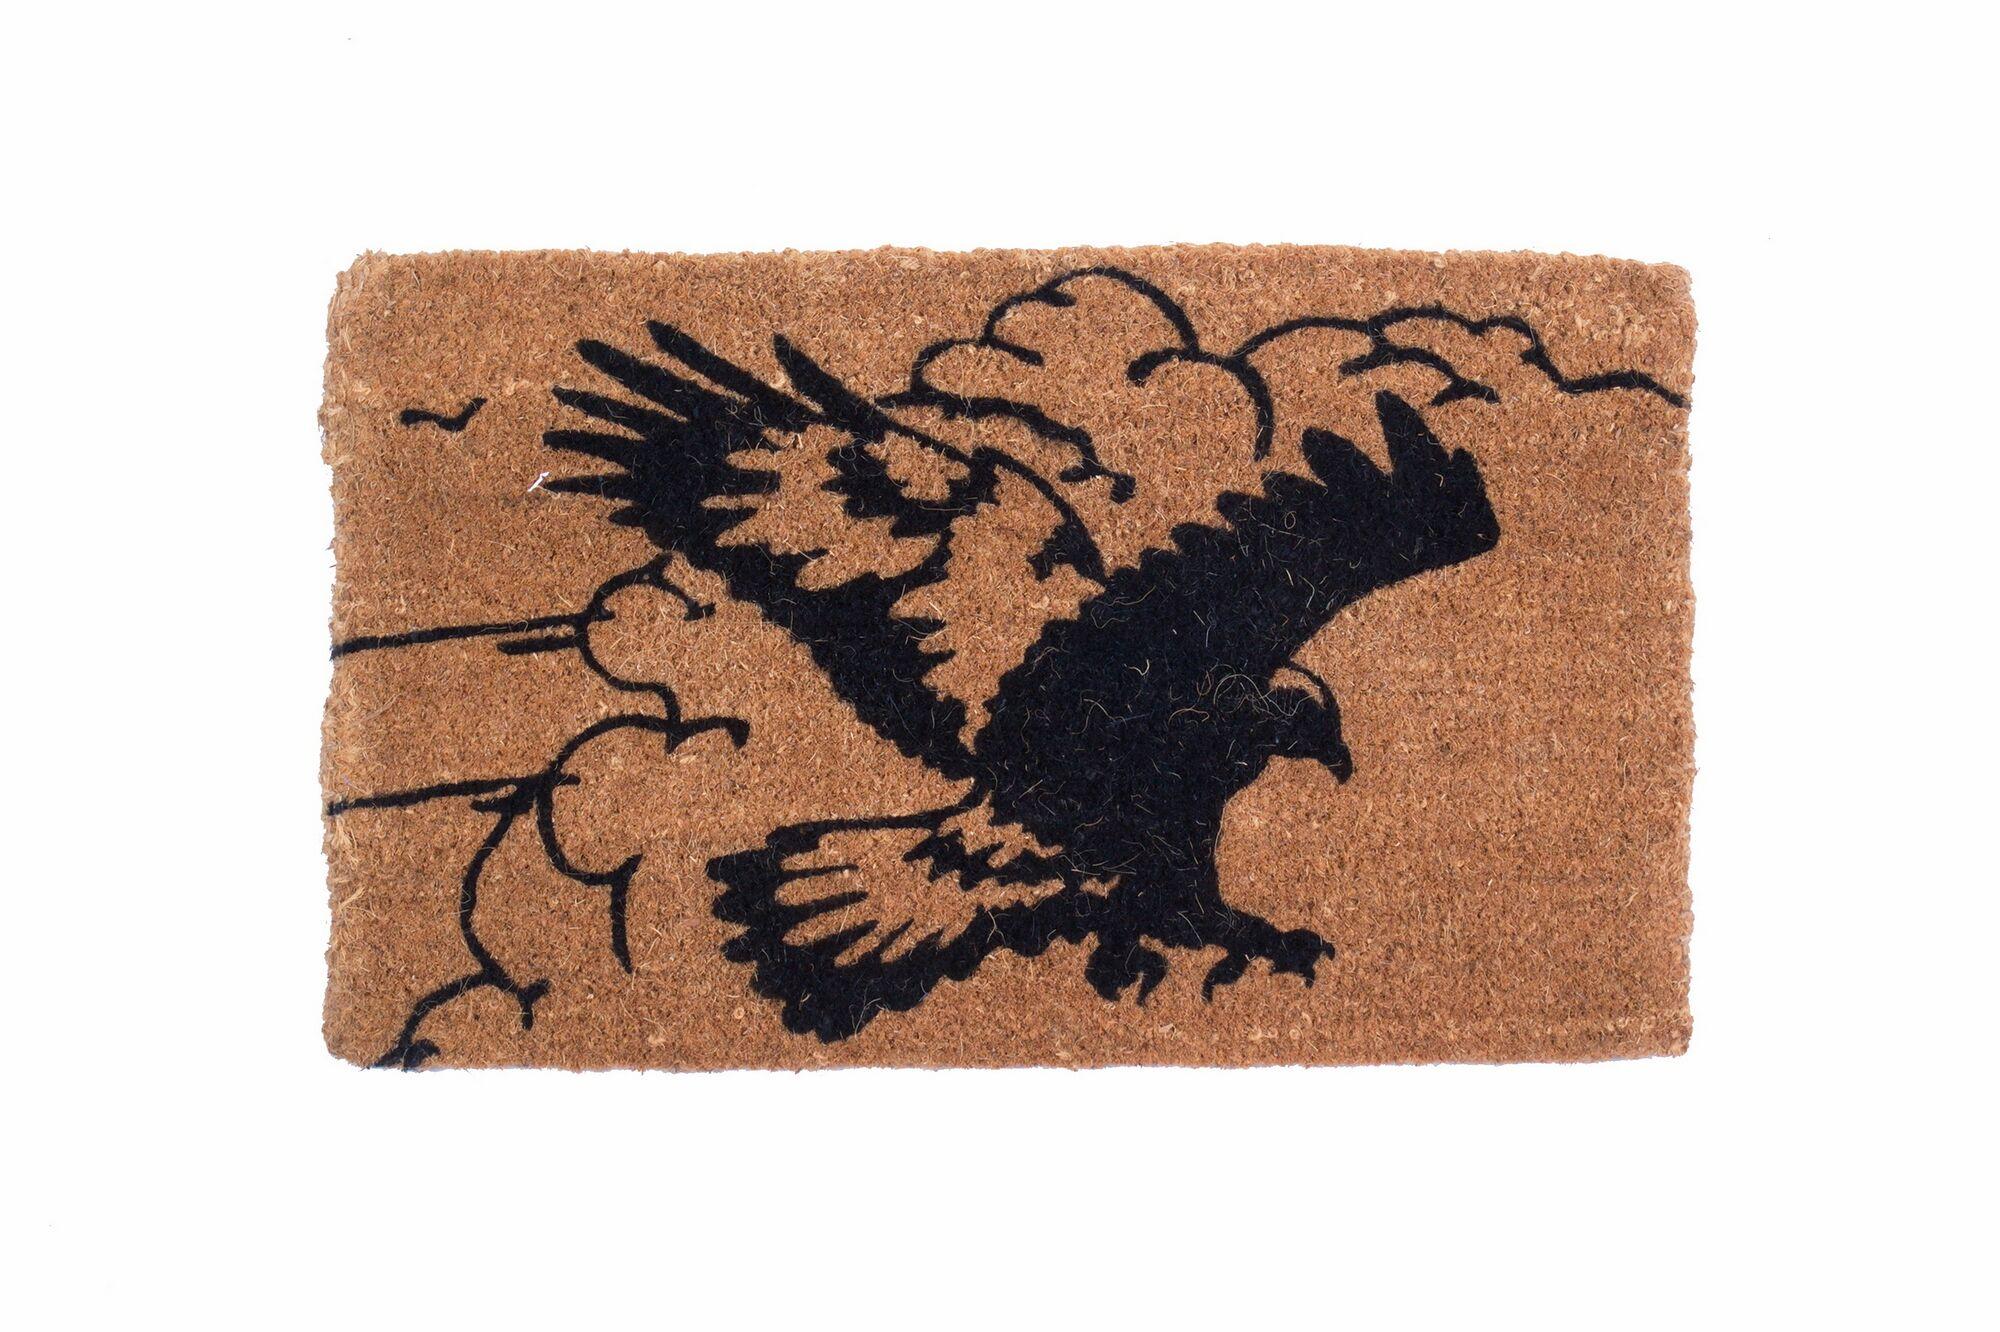 Pouncing Eagle Doormat